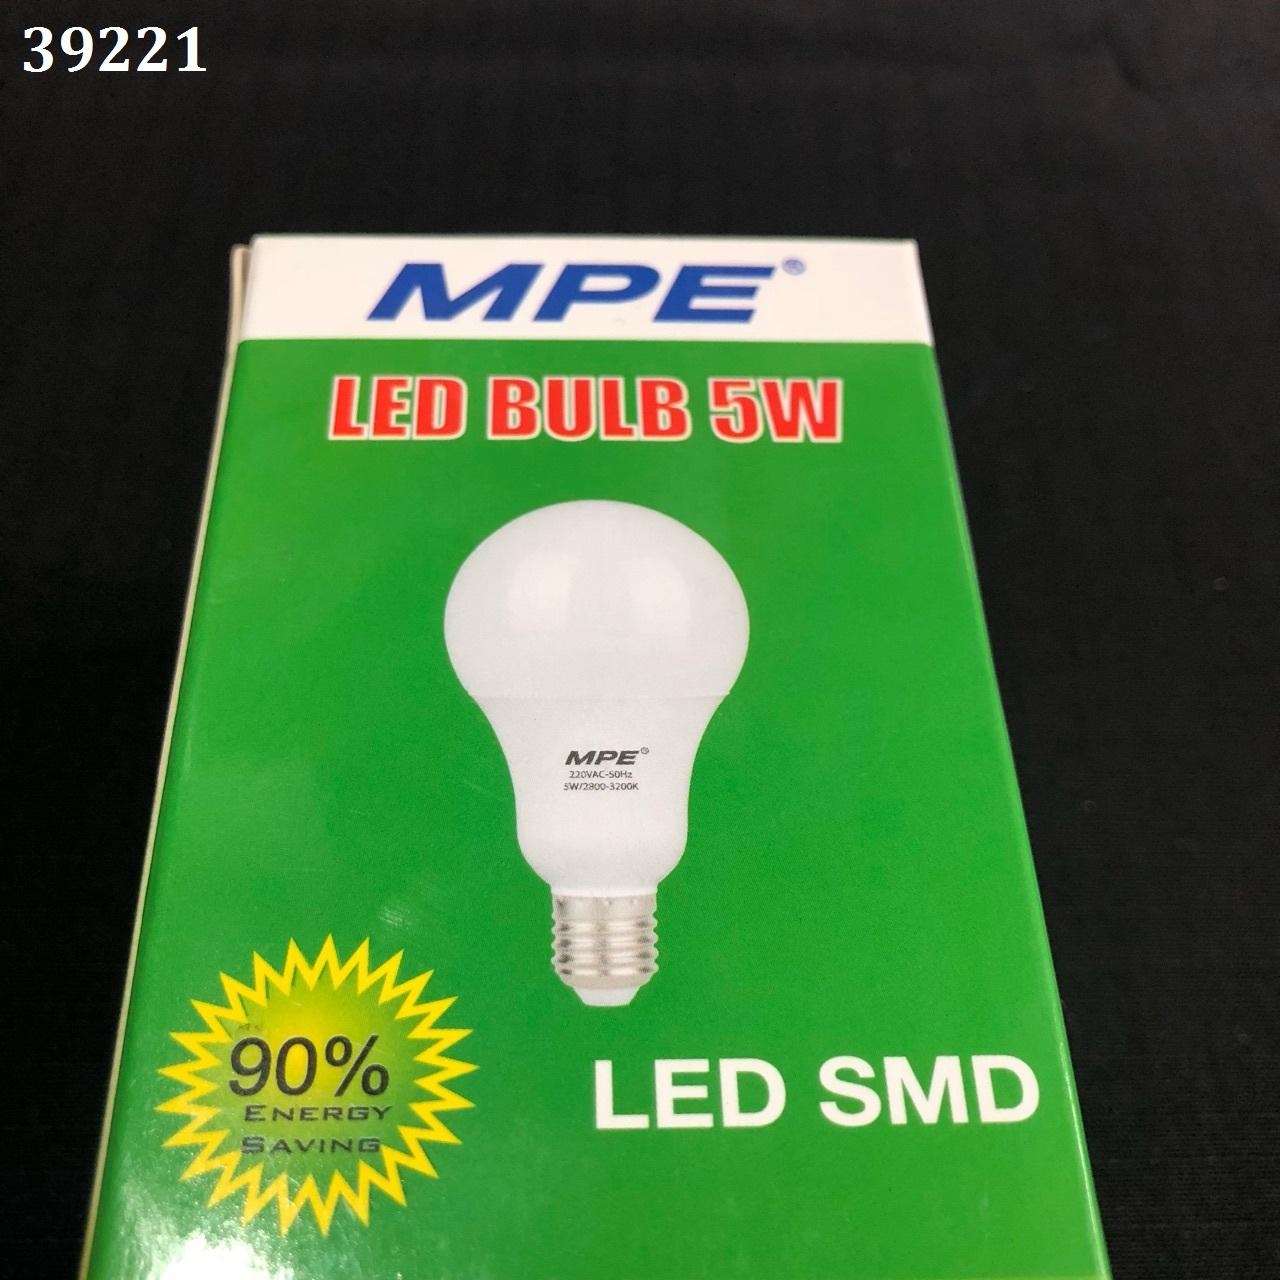 LED bulb 5w a / s yellow LBL-5V MPE